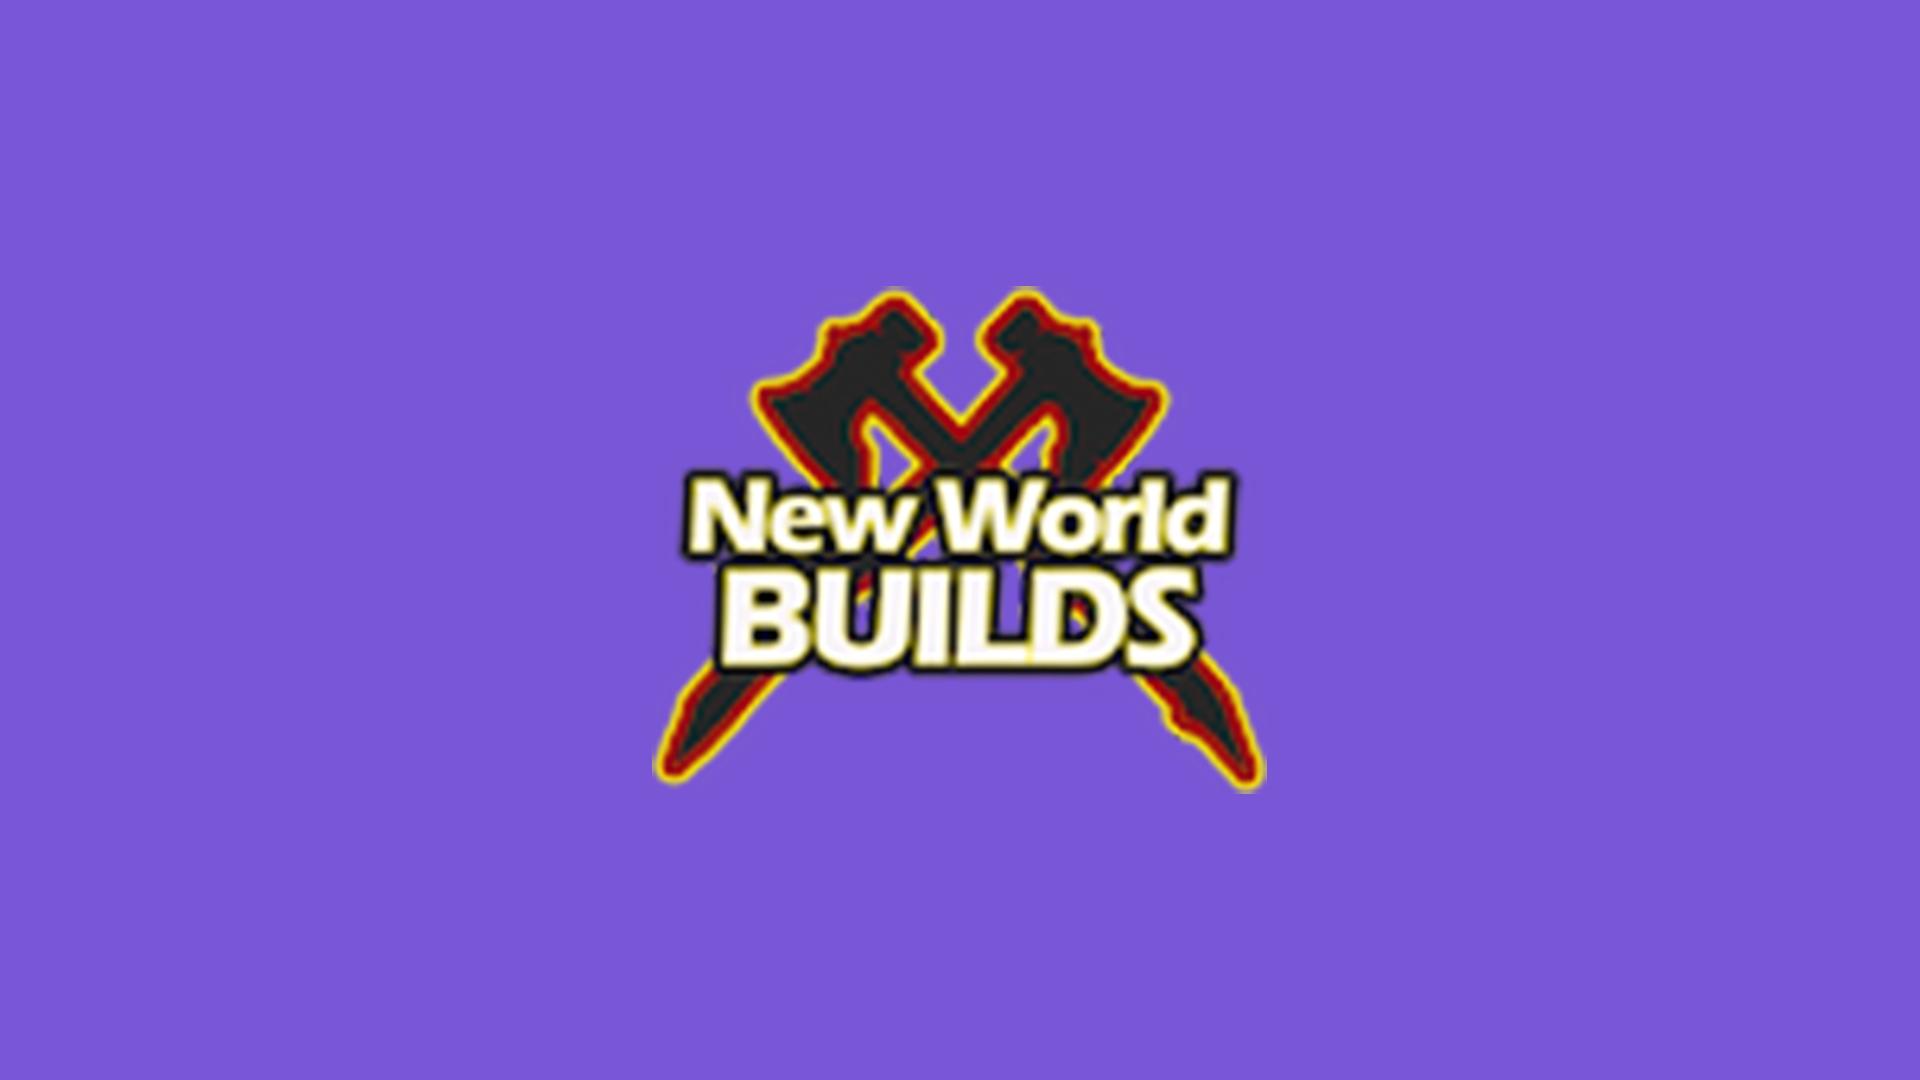 New-world-builds-logo